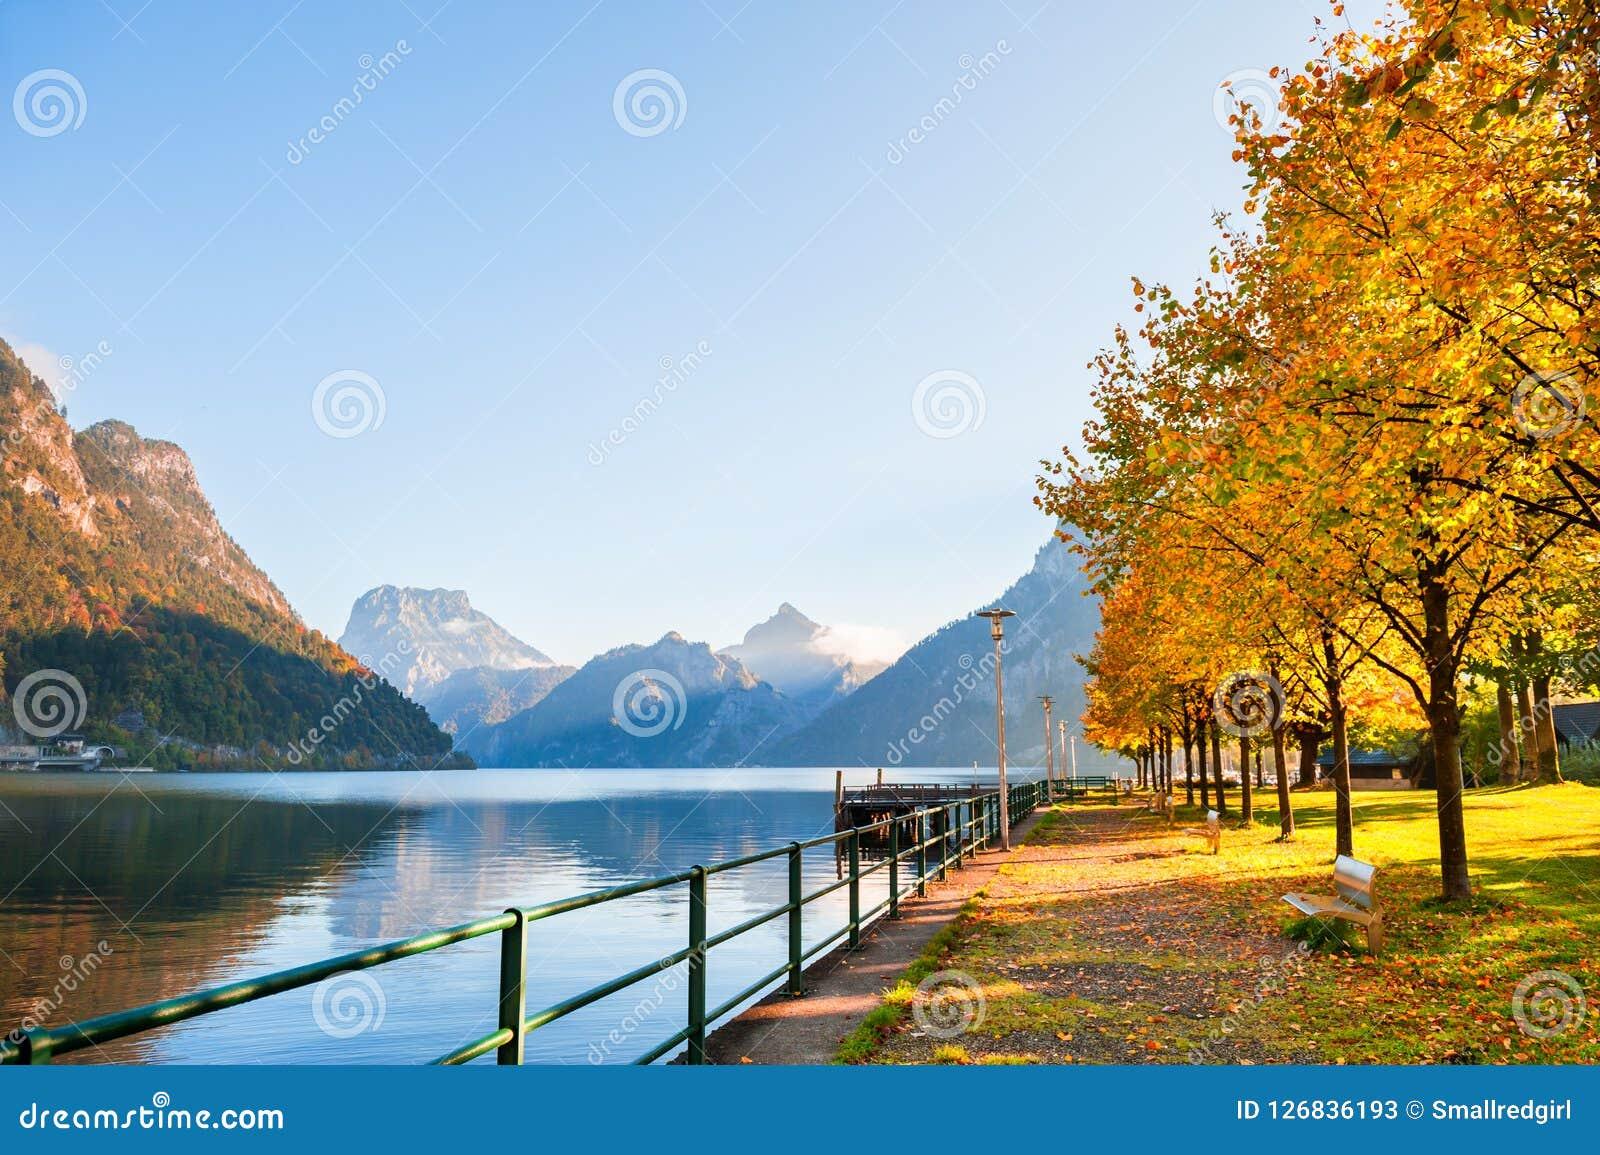 Yellow Autumn Trees On The Shore Of Lake In Austria Stock Image